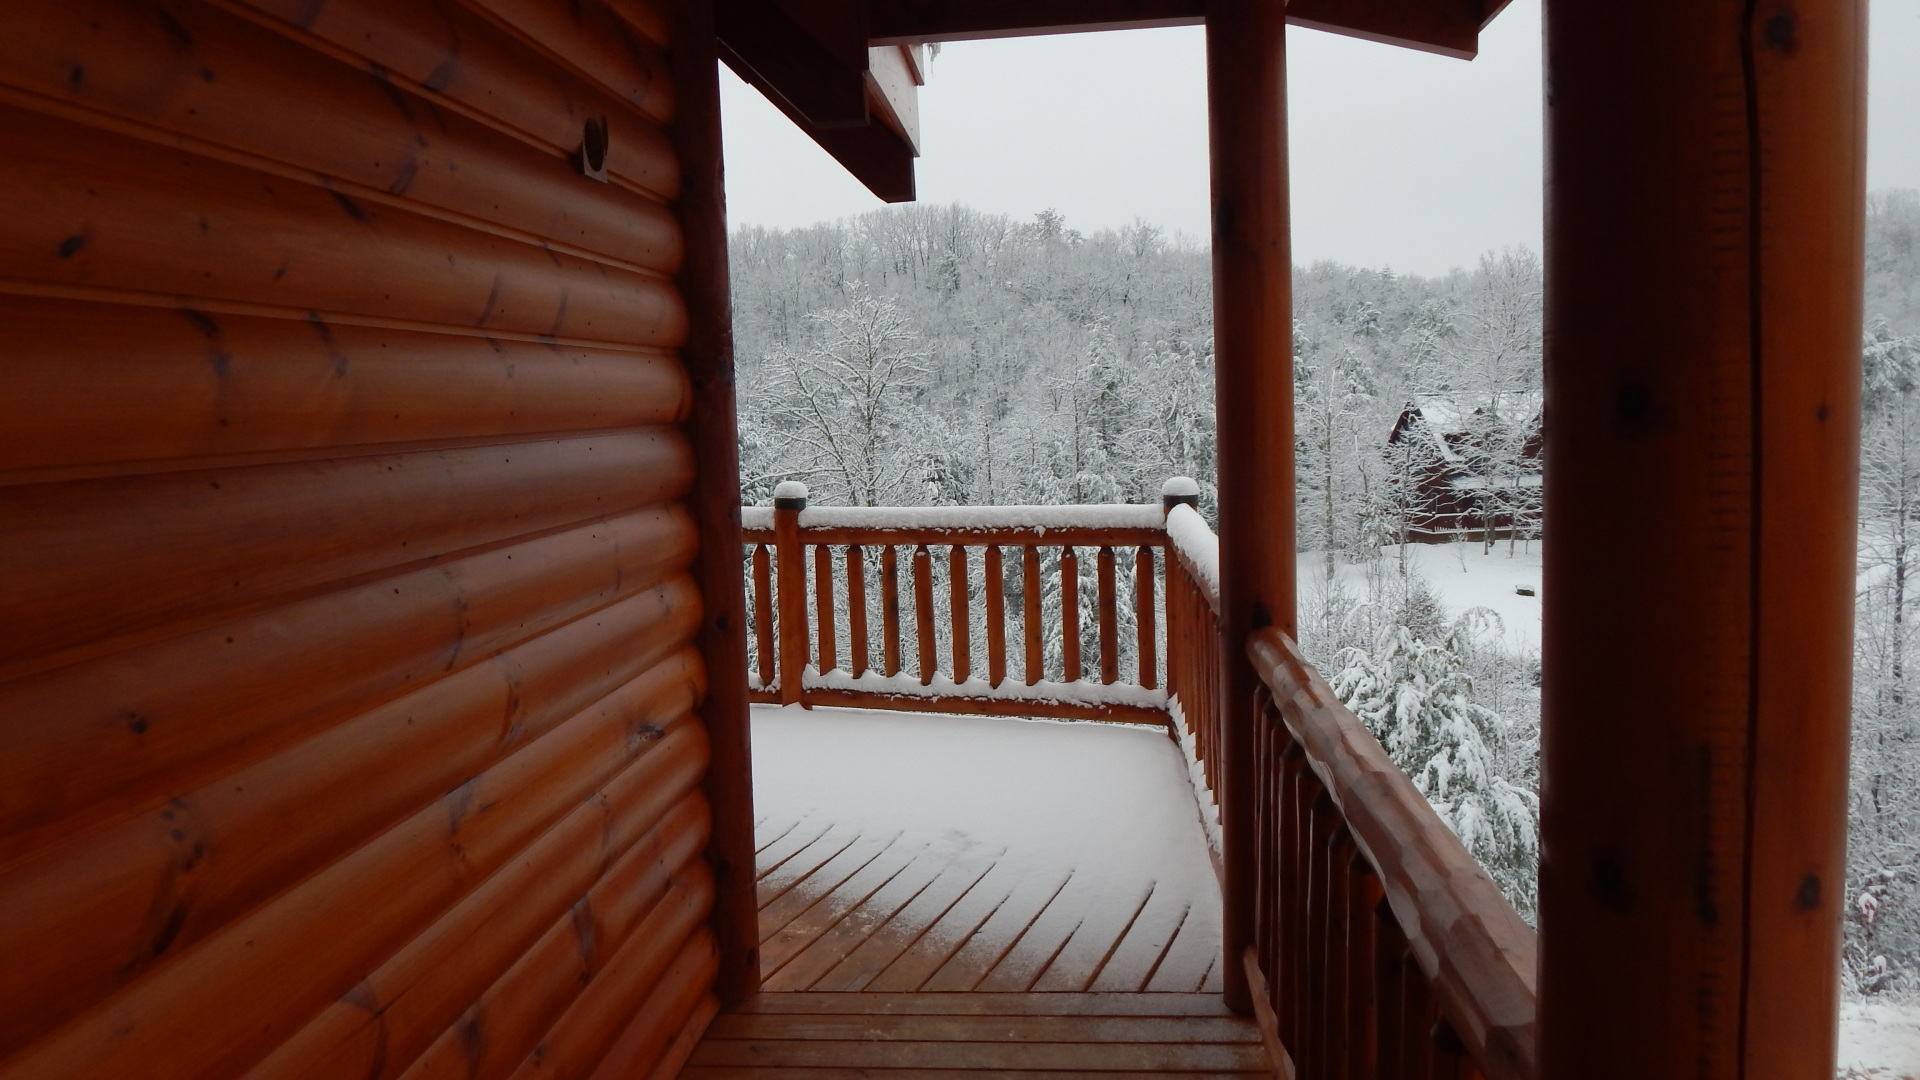 Ridge view lodge new 5 bedroom gatlinburg cabin by owner